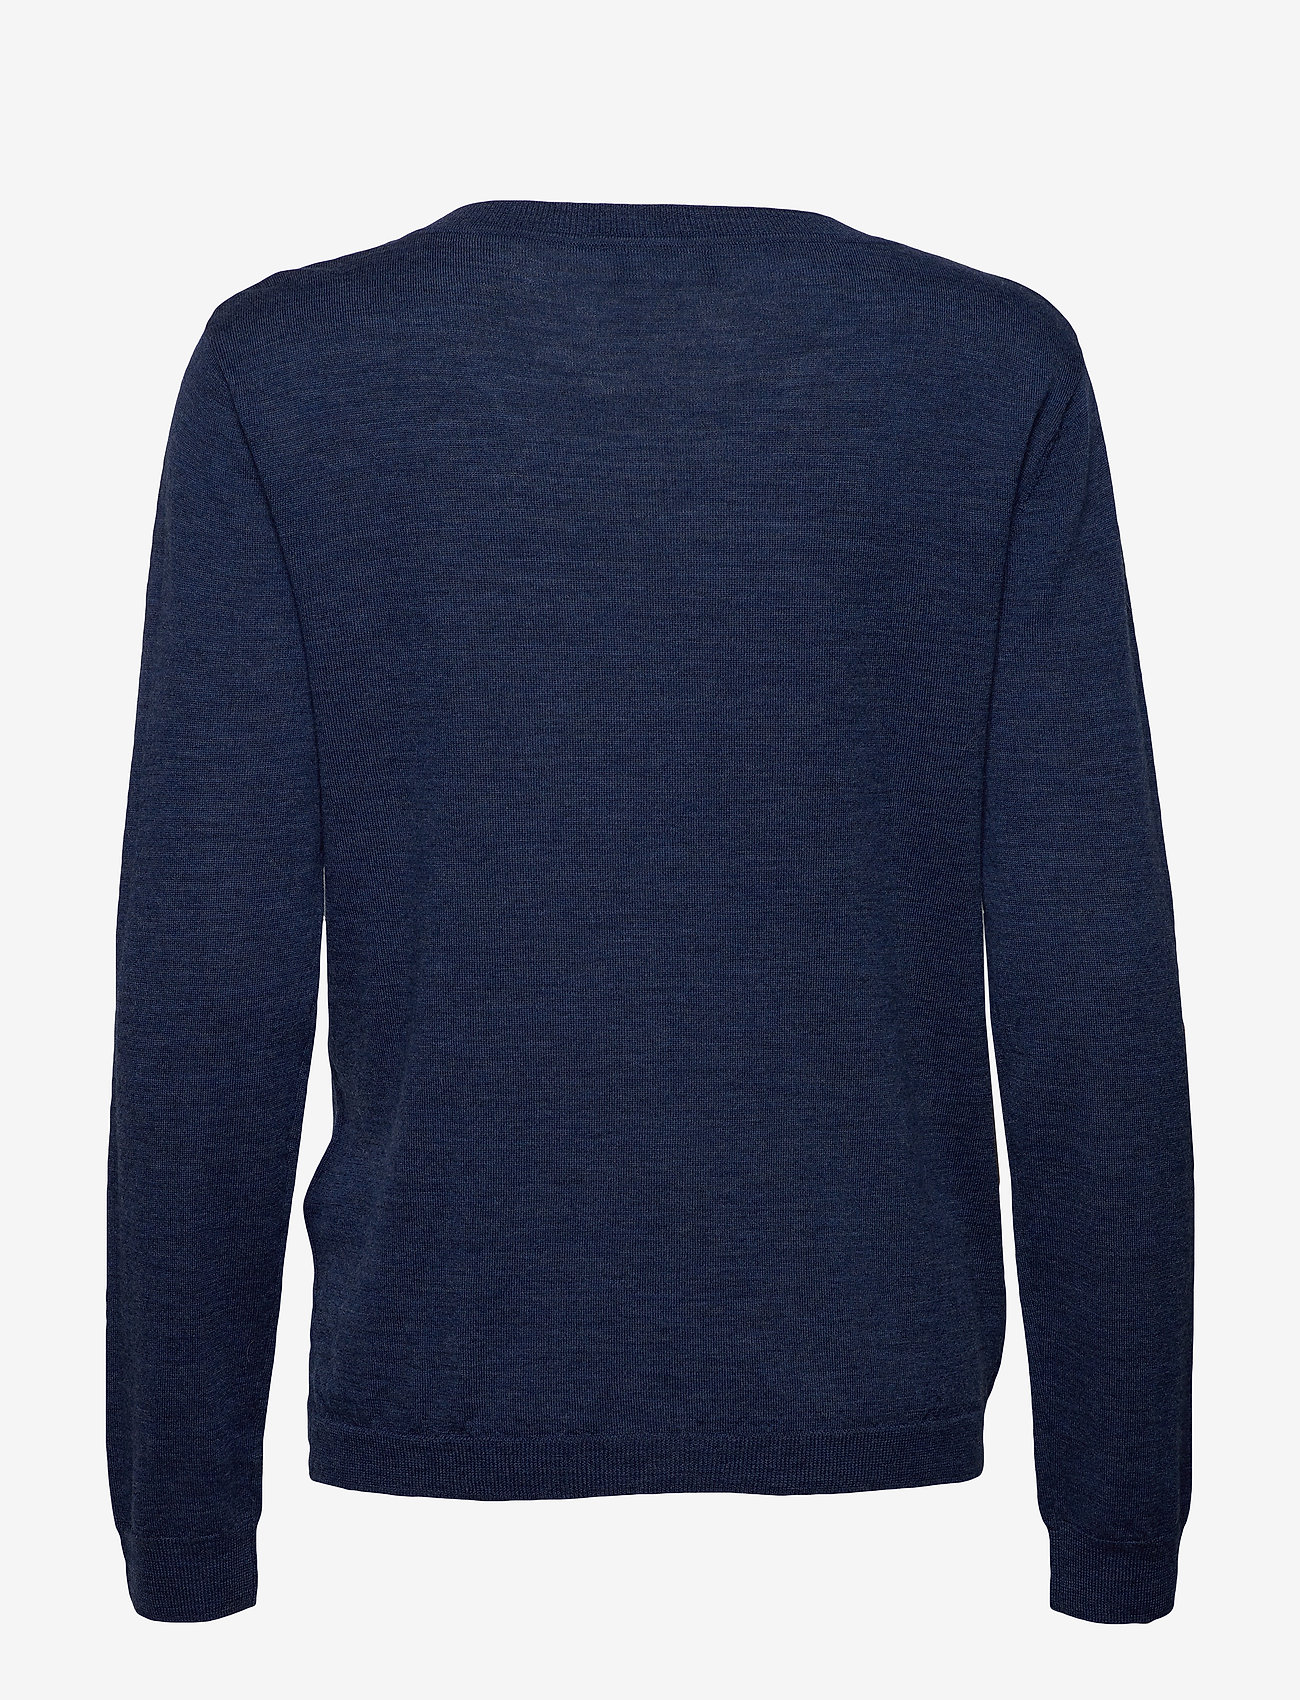 SAND - Fellini - Kandi - truien - medium blue - 1